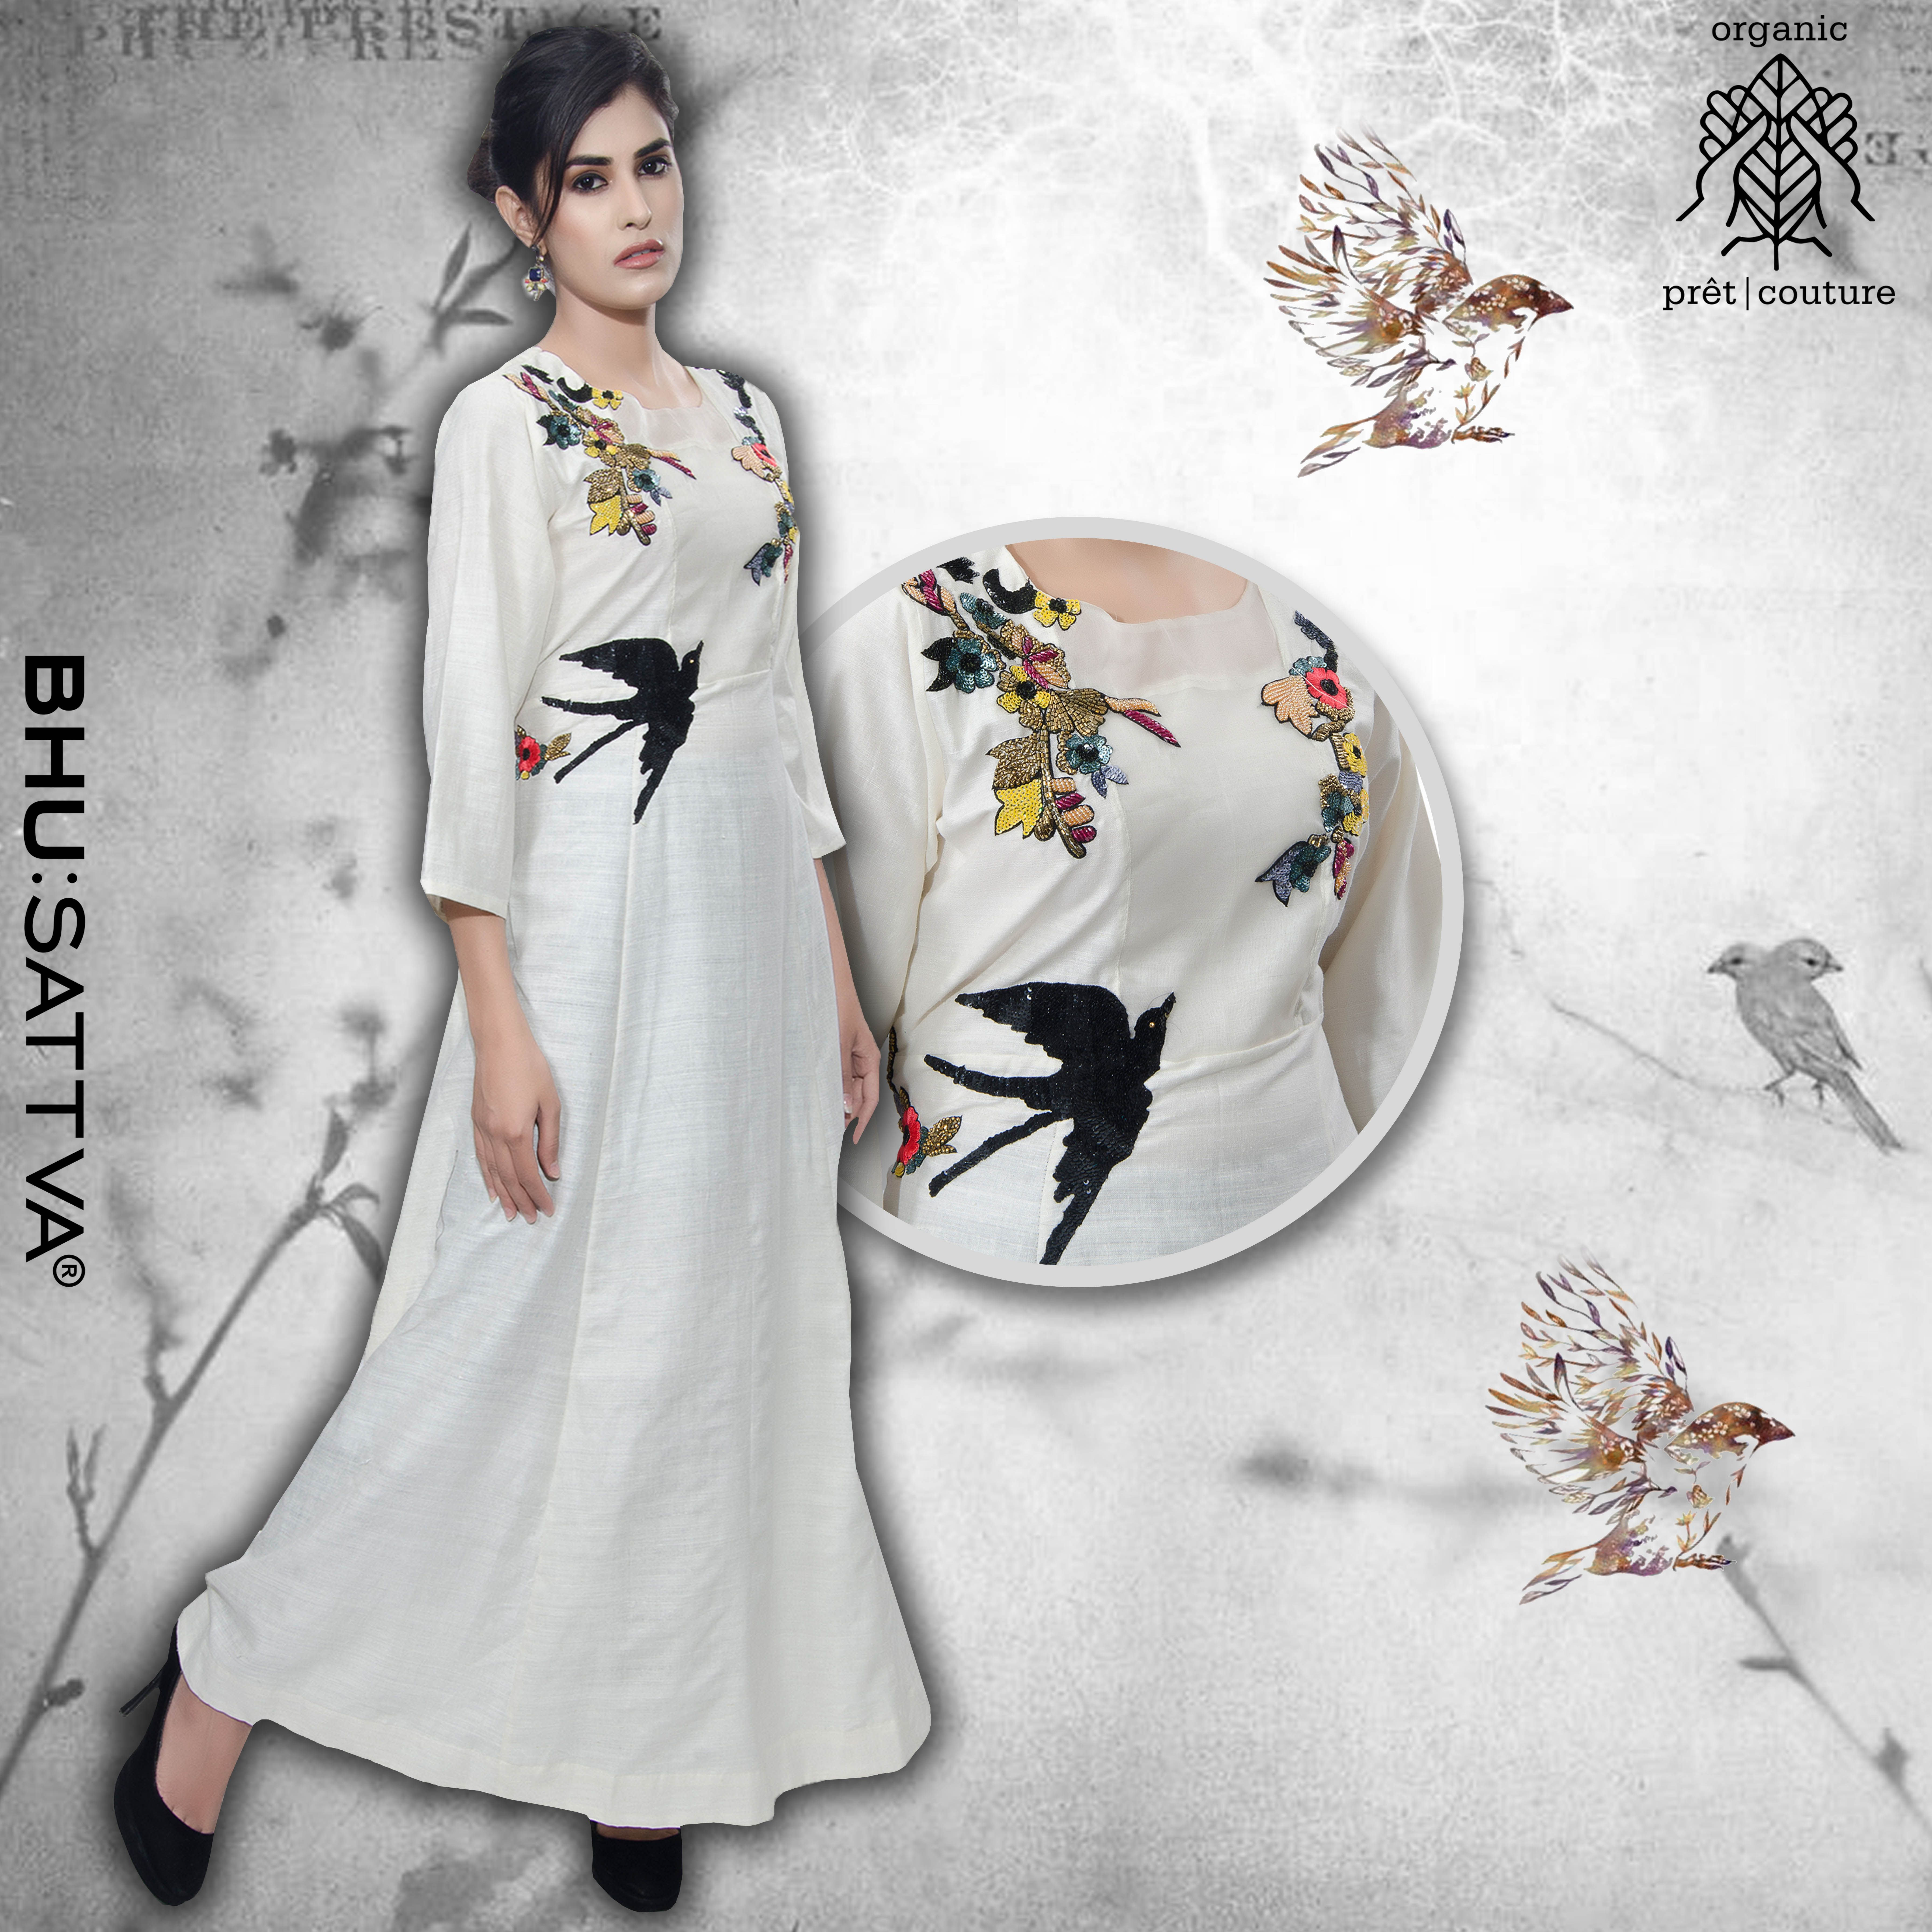 Fashion Is Art And You Are The Canvas. • • • • • #Bhusattva #Organic #Pret #Couture #white dress #HandCrafted#SkinFriendly#BreatheEasy#ReflectOrganic#RevealYourself#iWearBhusattva#BelieveWhatYouWear #TrustNature#ArtInspired#MysticalNature#CloseToNature#OrganicIdeology#OrganicCollection #NaturalDyes#EcoFashion#OrganicFashion#SustainableFashion#GoOrganic#WearOrganic#DesignerLabel#DesignerWear#EcoFriendly#MadeInIndia #MakeInIndia